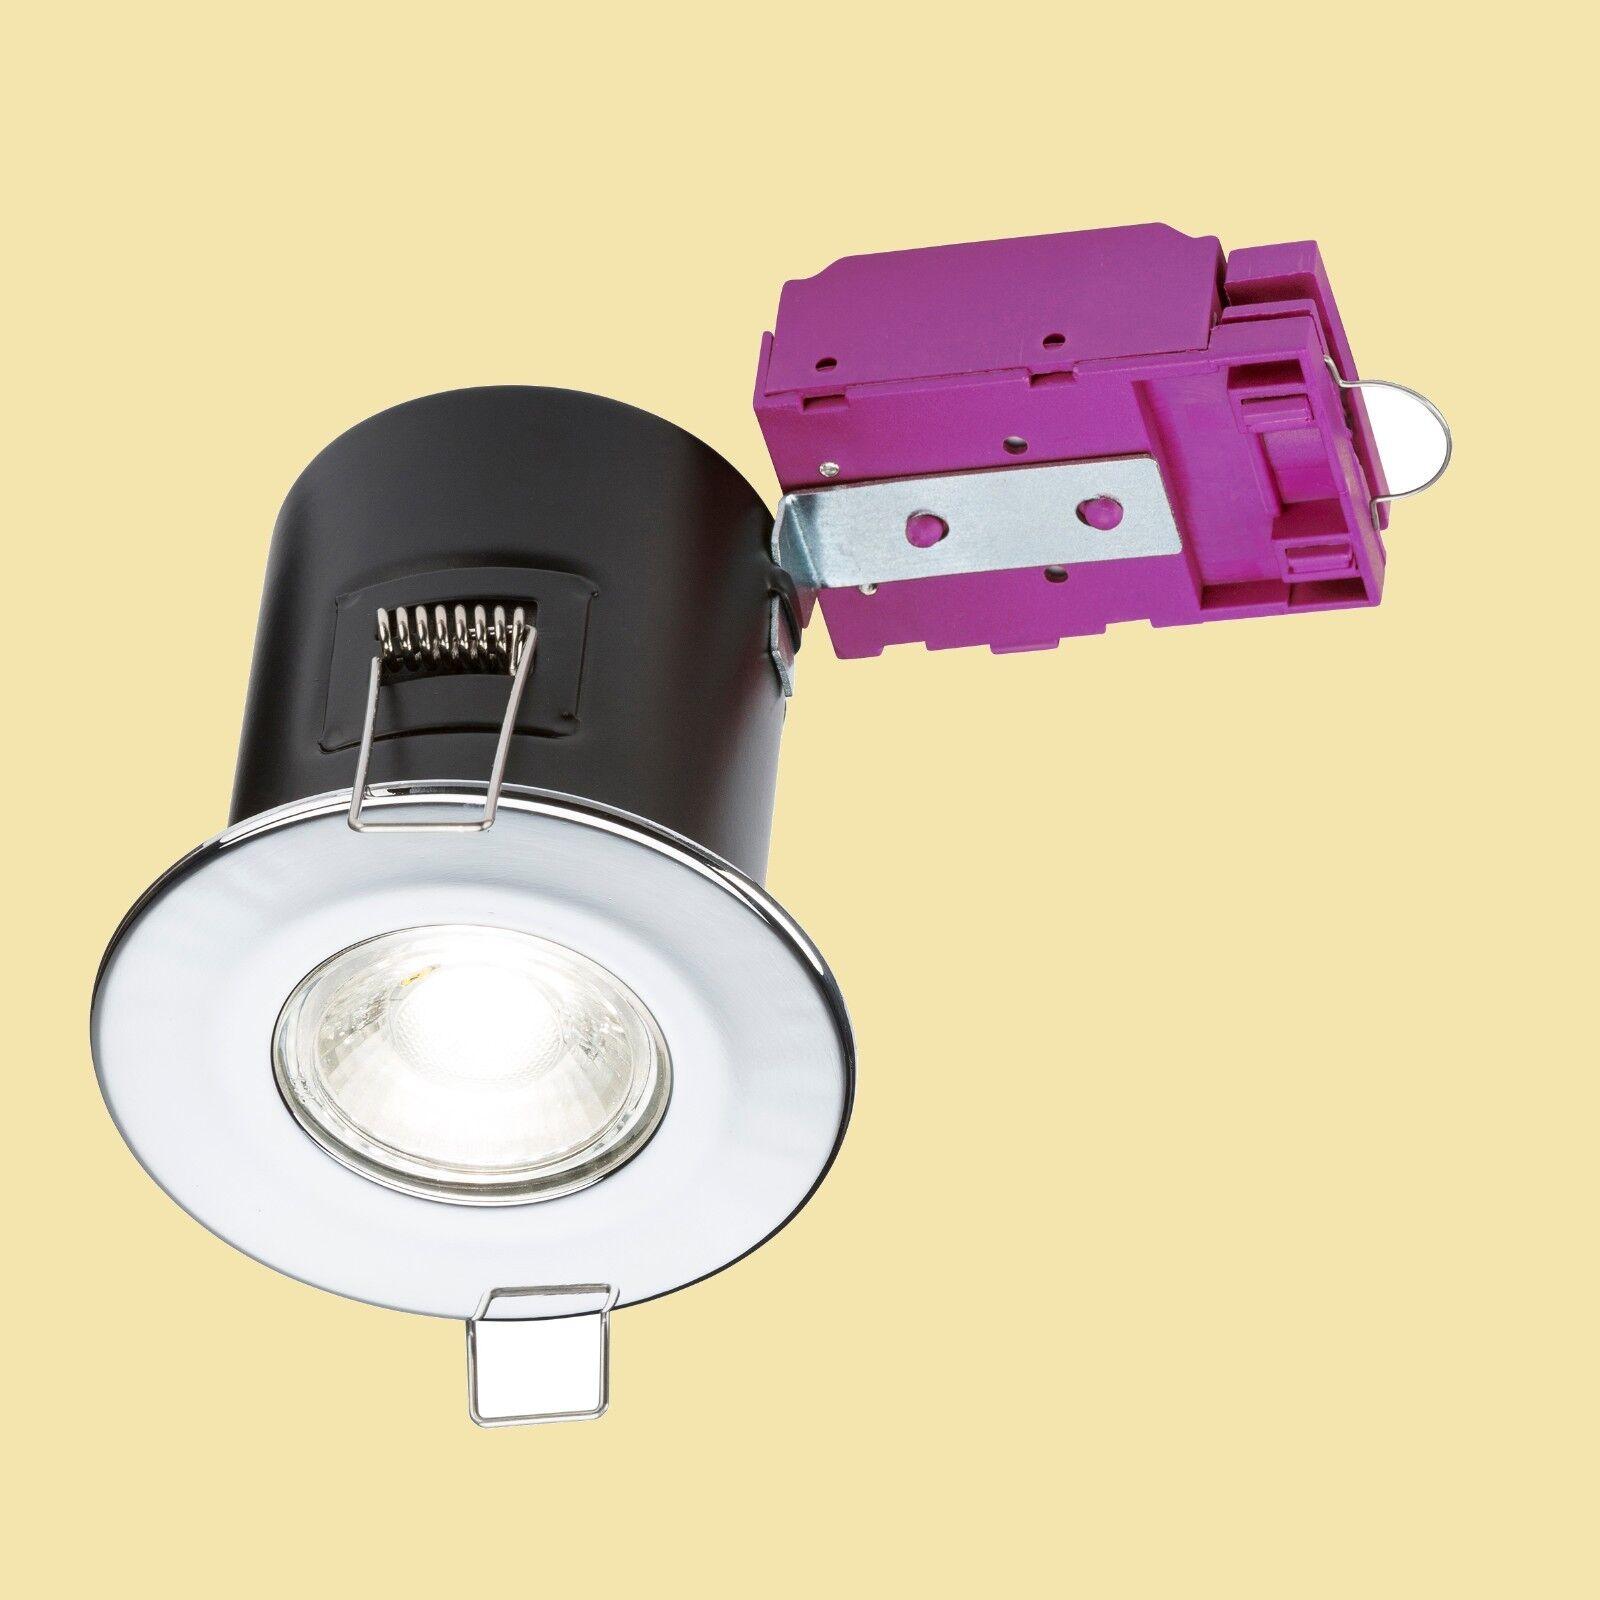 20 Knightsbridge Fire Rated gu10 DEL Recessed Ceiling Ceiling Ceiling Spotlights presque Fix | Sortie  d57c36